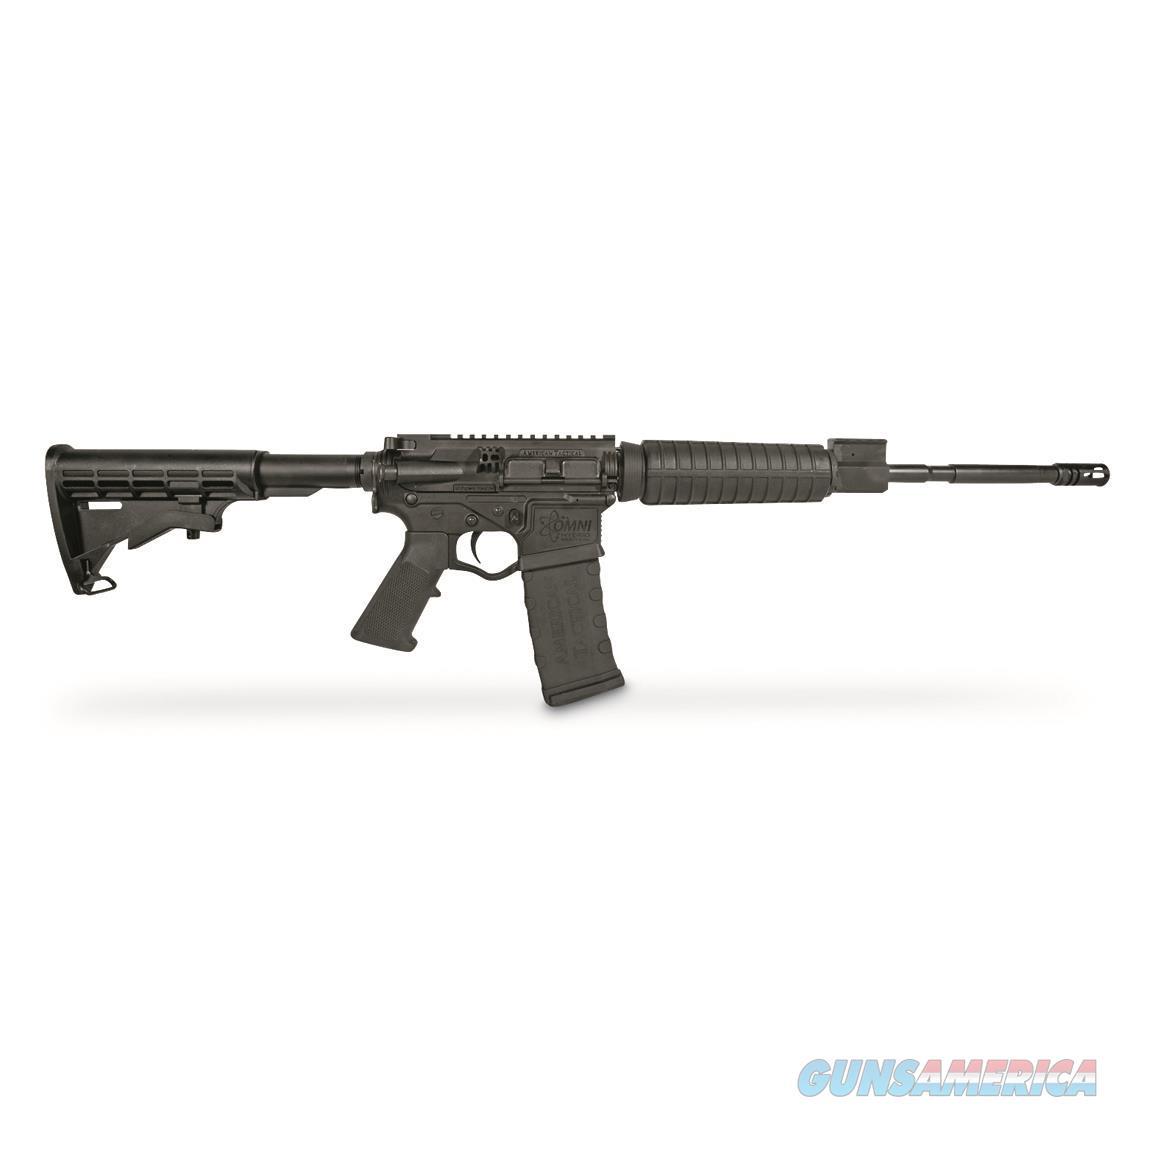 "New! - ATI Omni Hybrid P3 5.56x45mm 16"" ATIGOMX556P3  Guns > Rifles > American Tactical Imports Rifles"